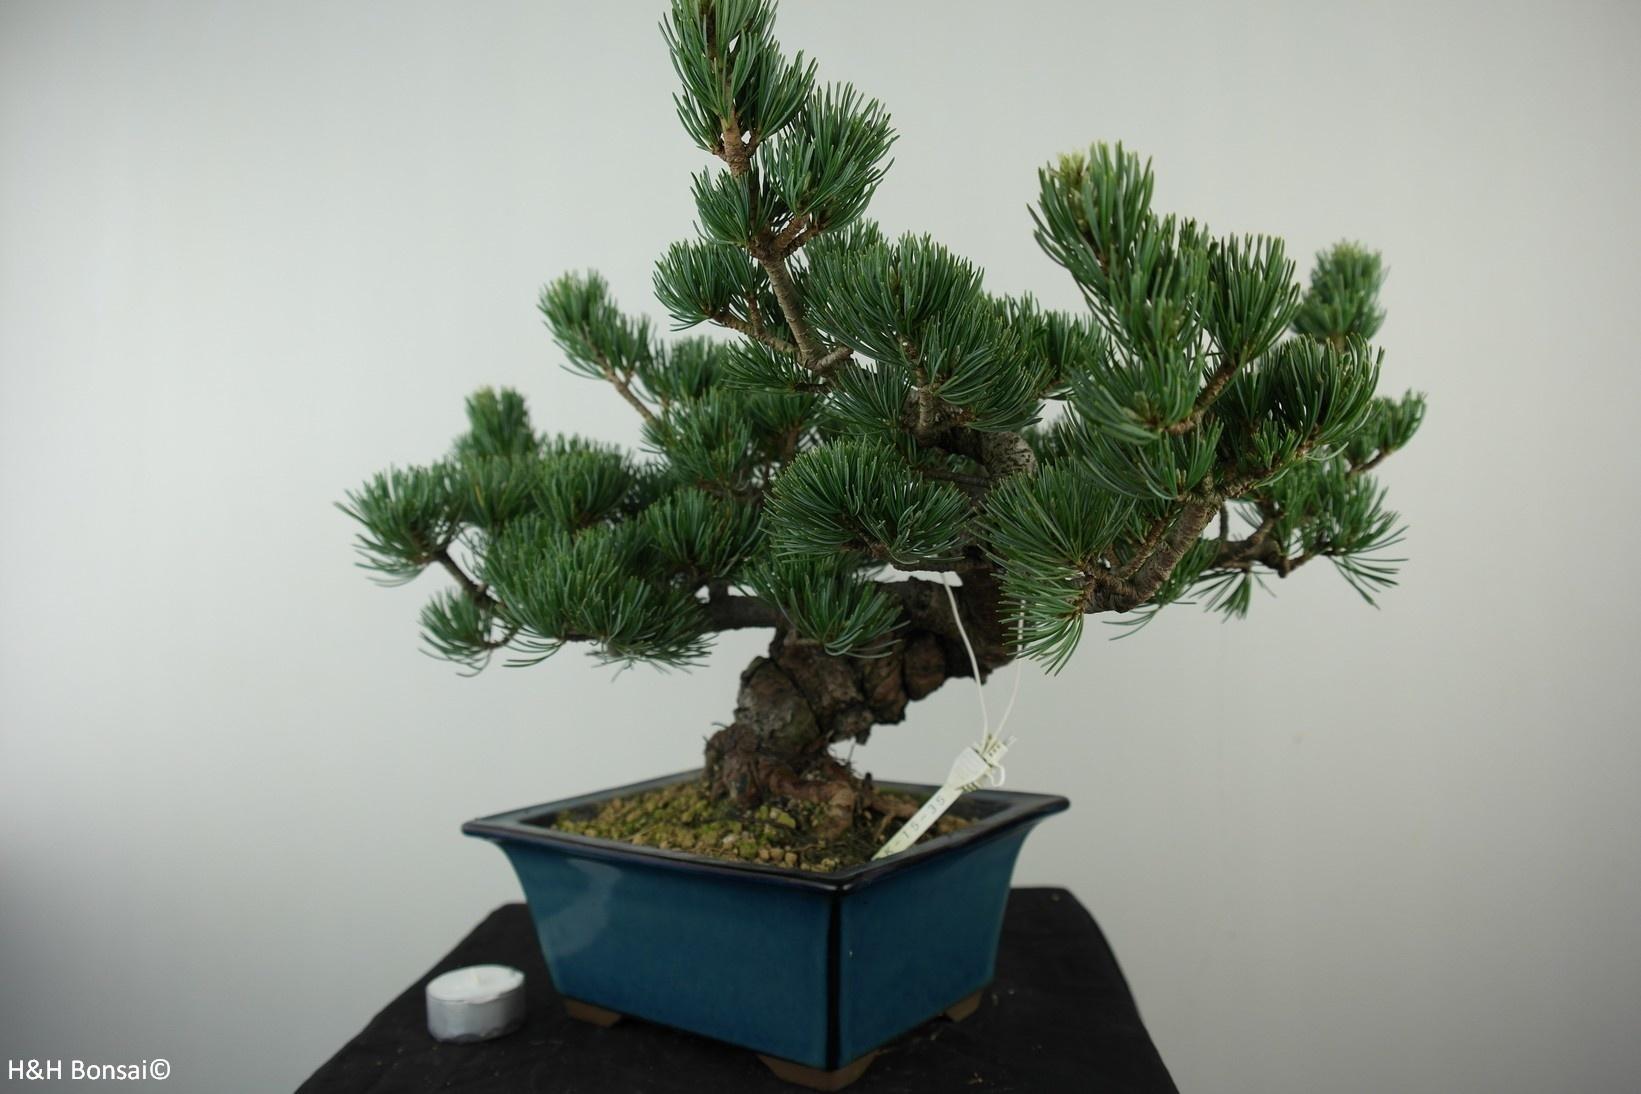 Bonsai Pinus pentaphylla, Japanse witte den, nr. 7807